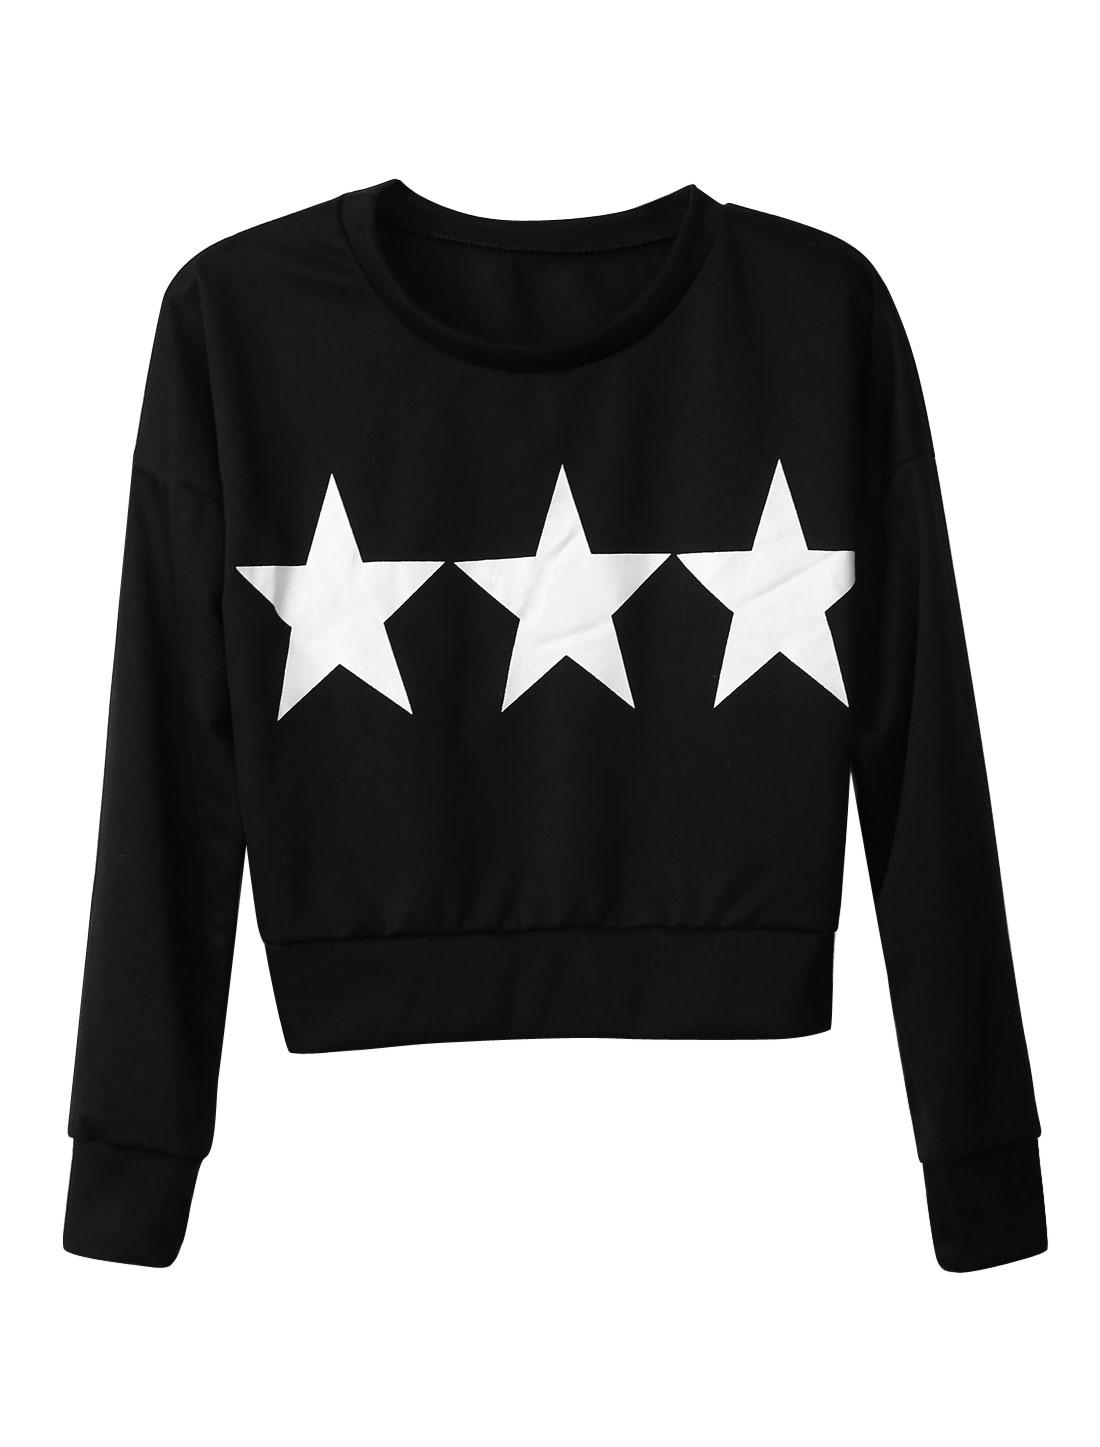 Women Stars Pattern Long Sleeves Pullover Korean Style Crop Top Black XS